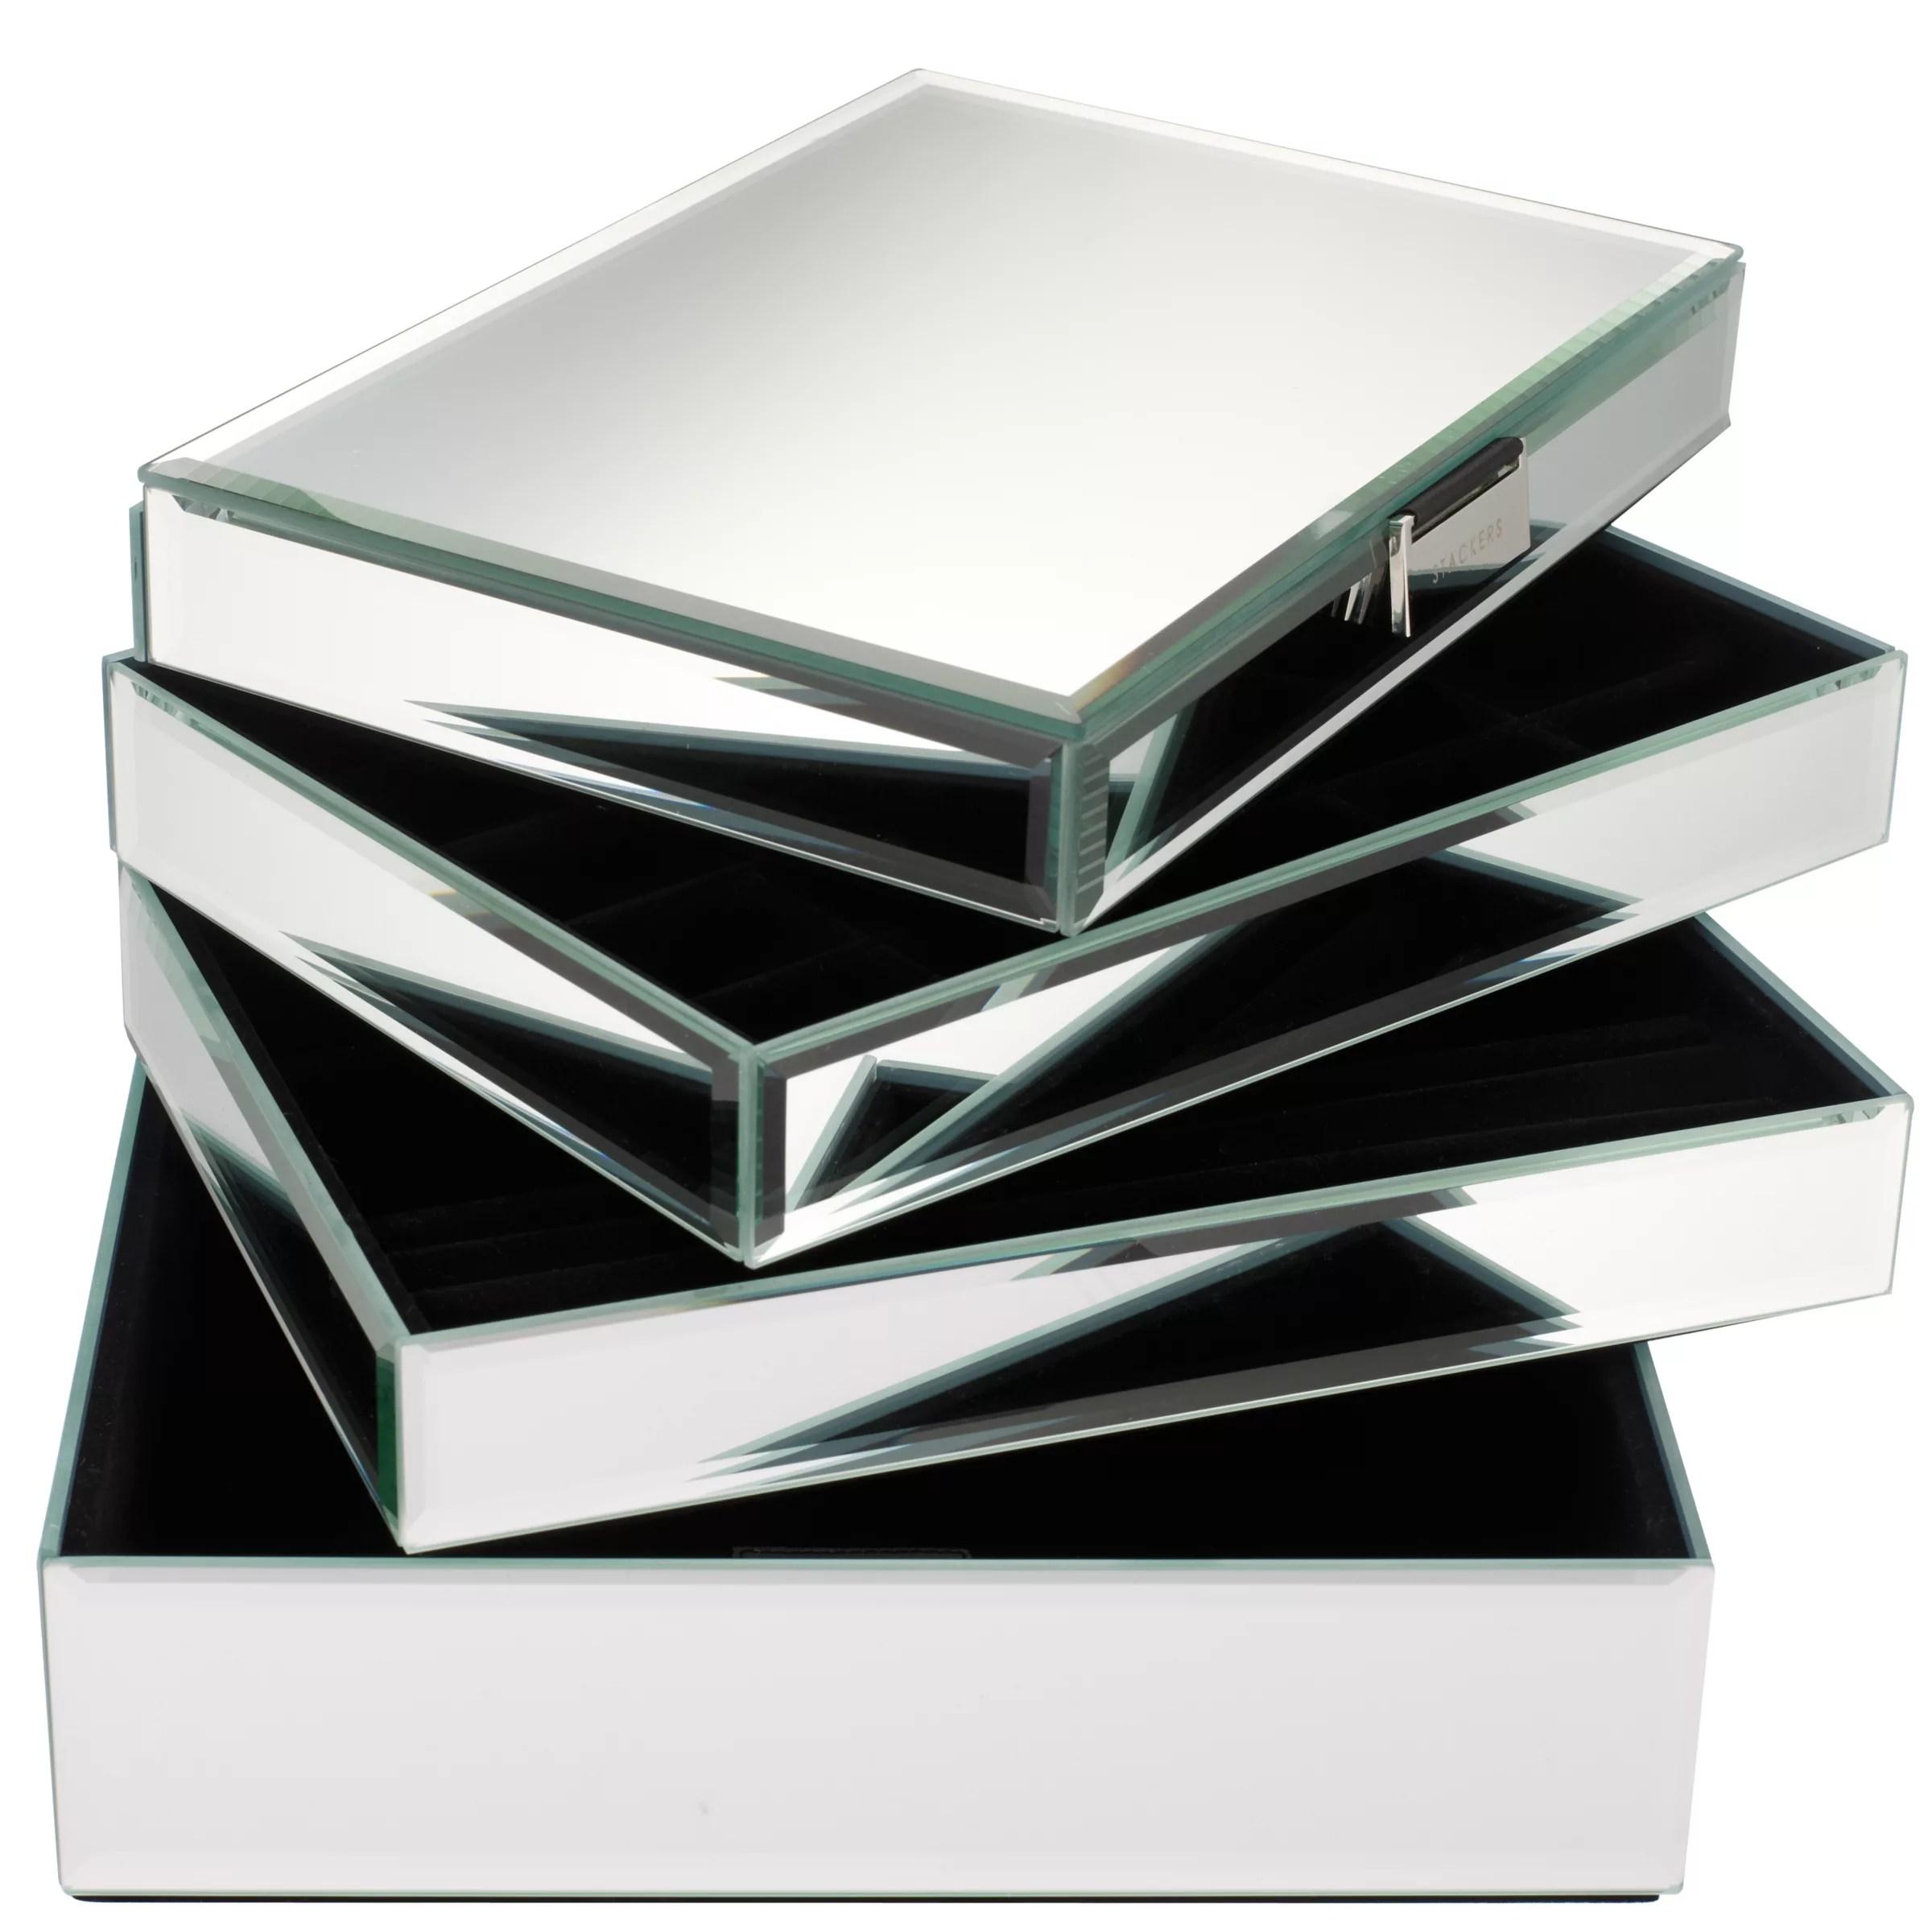 Buy Stackers Glass Jewellery Boxes John Lewis